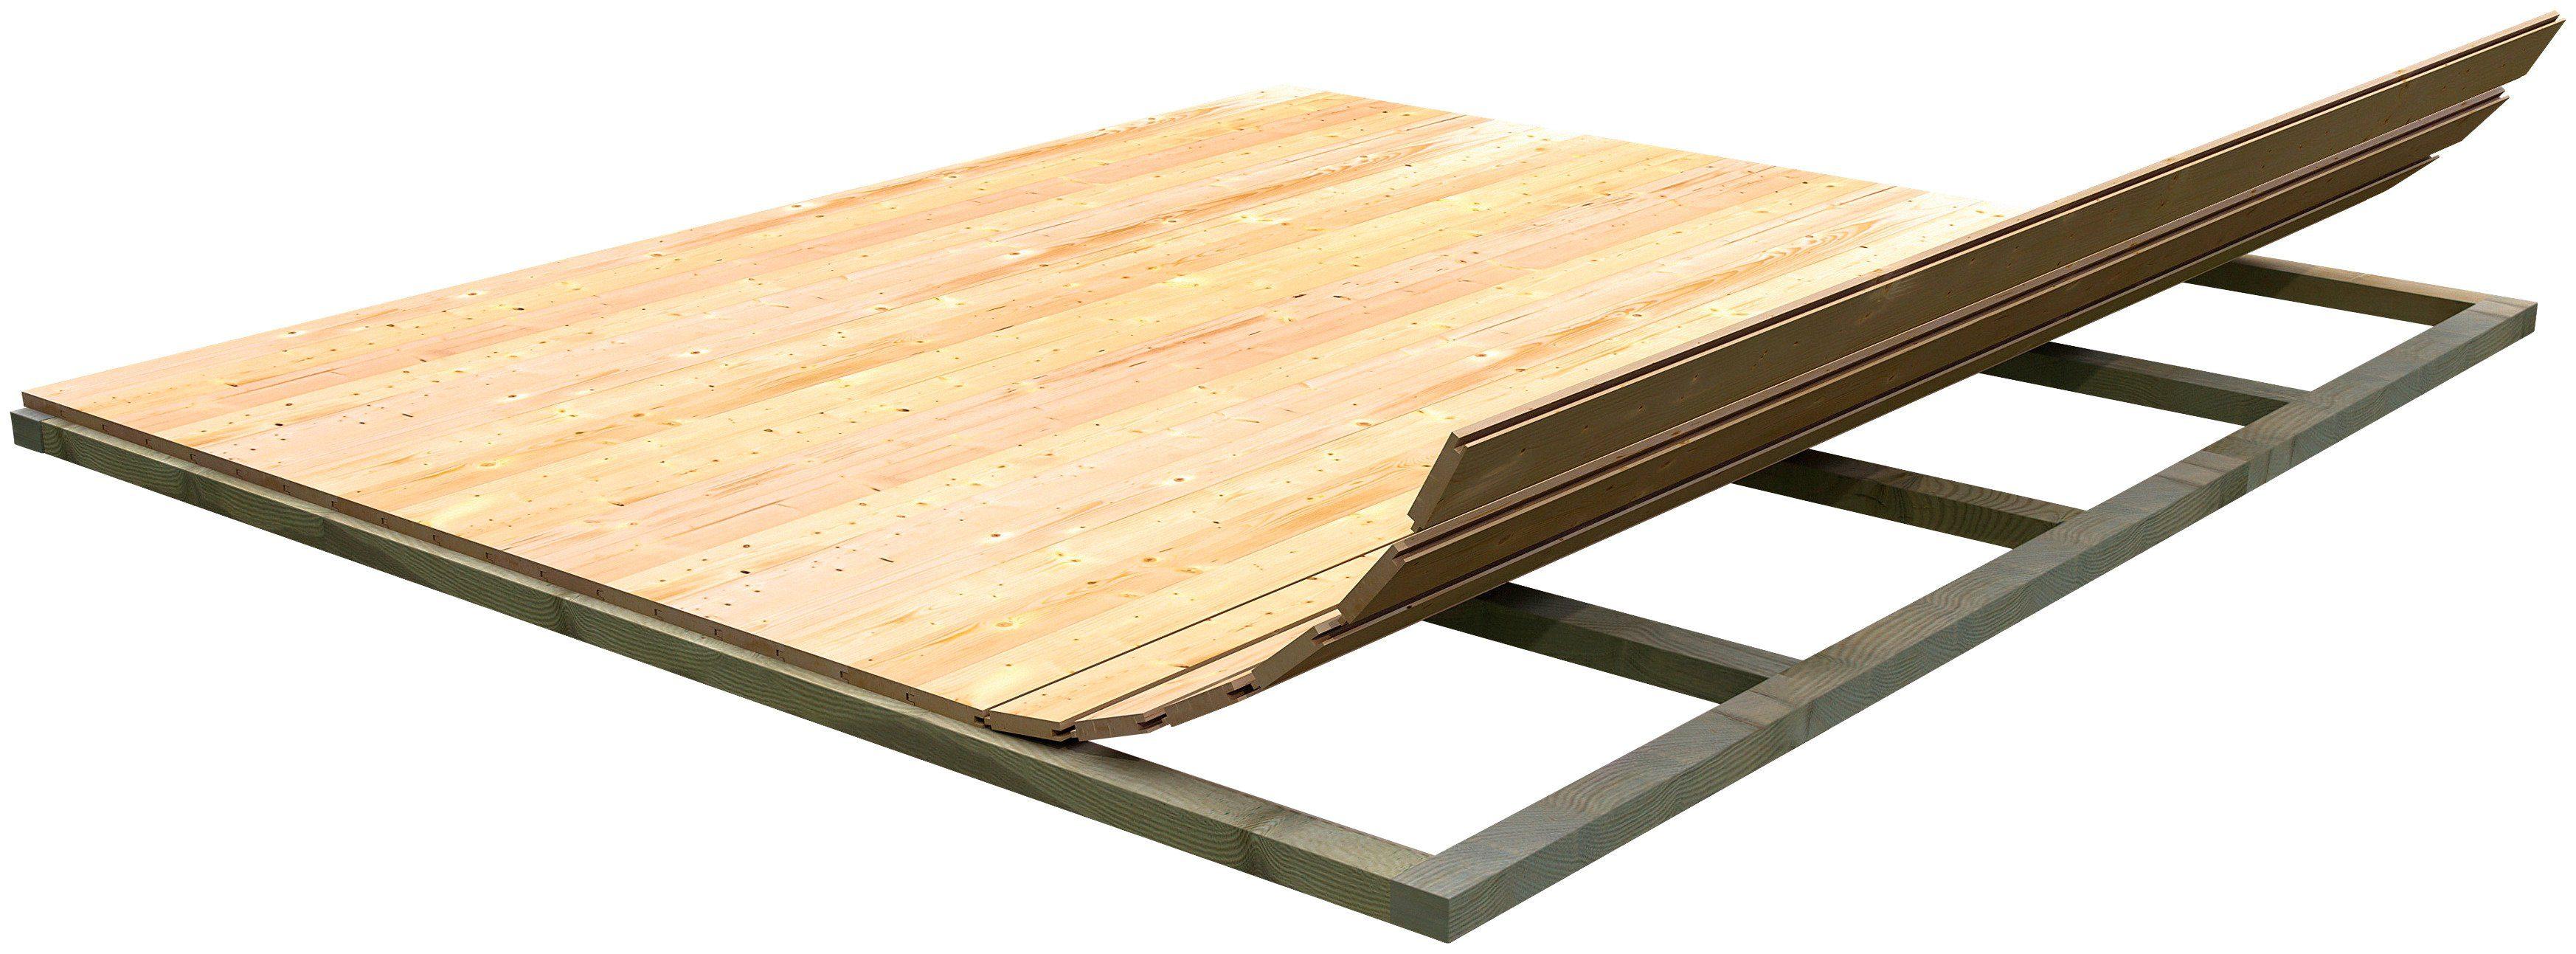 Karibu Fußboden für Gartenhäuser, BxT: 220x220 cm